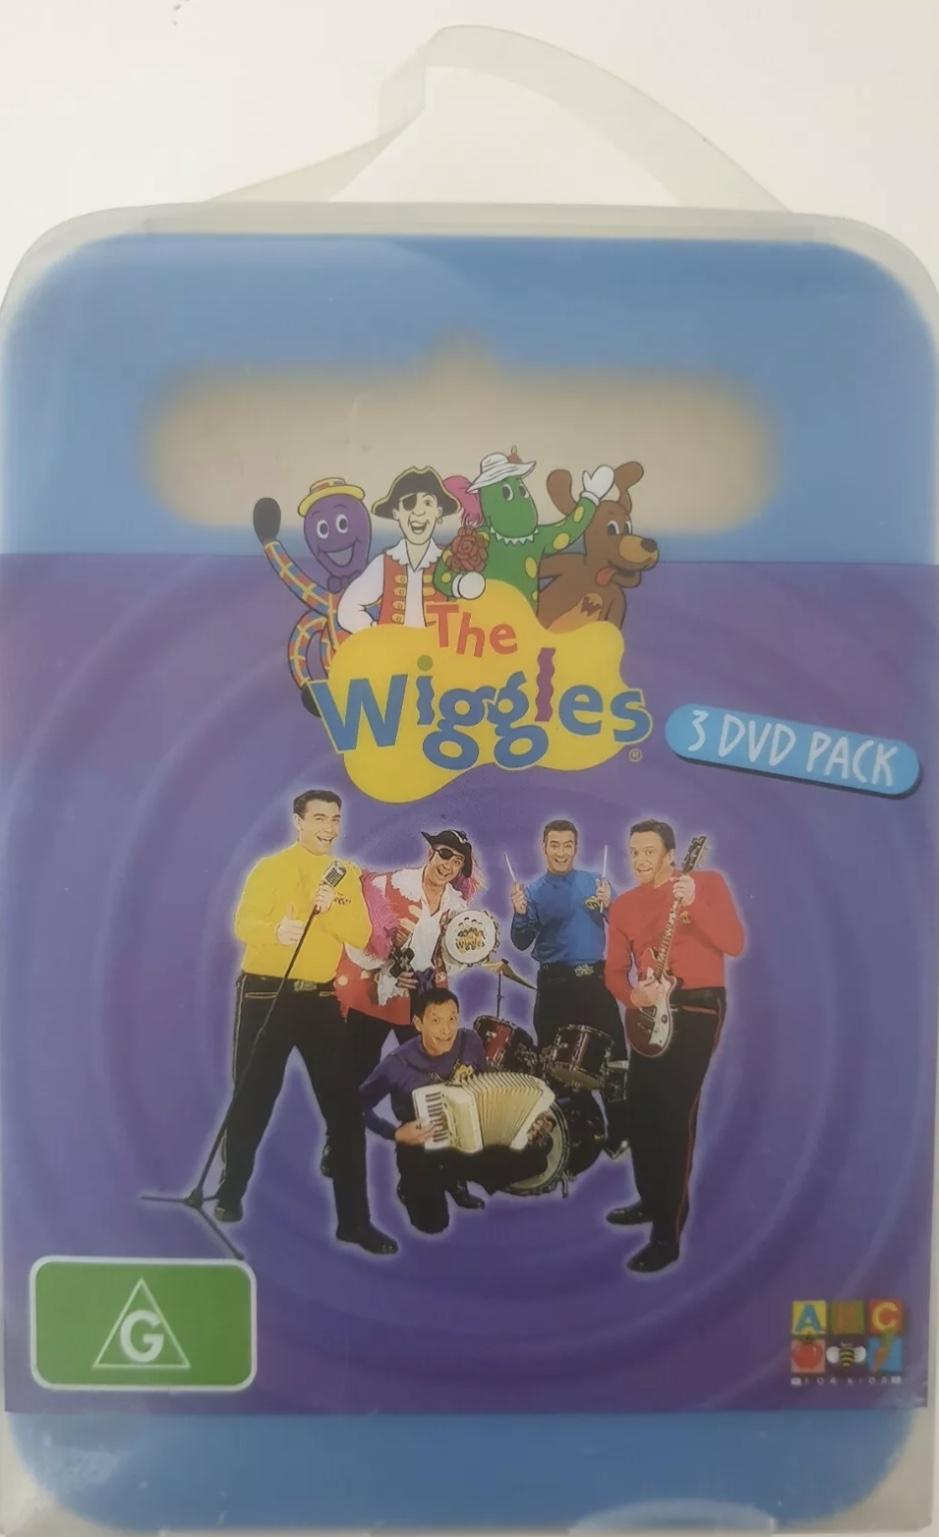 3 DVD Pack! (ABC)